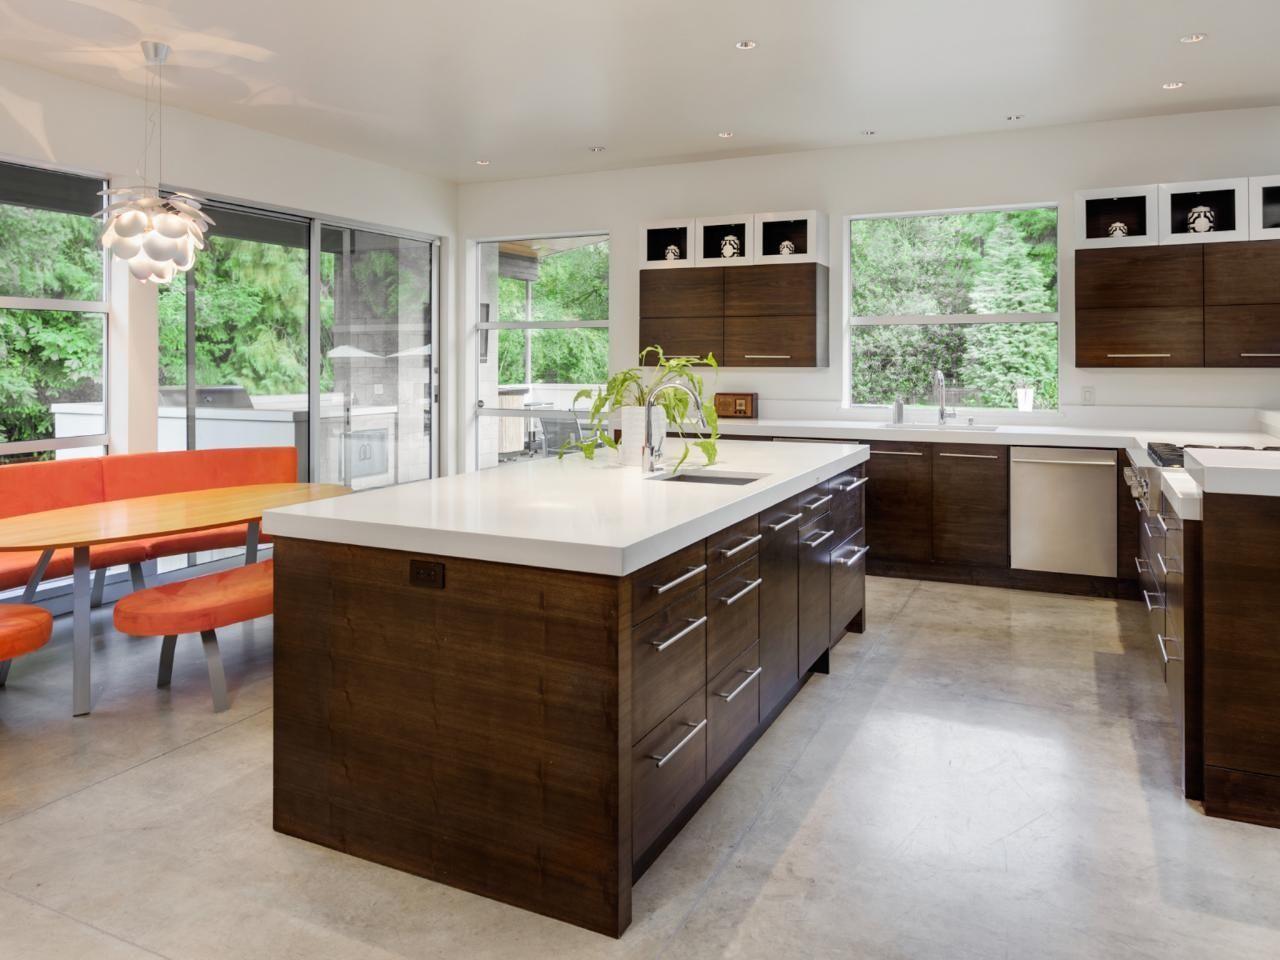 Best Flooring For The Kitchen  Httpweb4Top  Pinterest New Kitchen Floor Options 2018